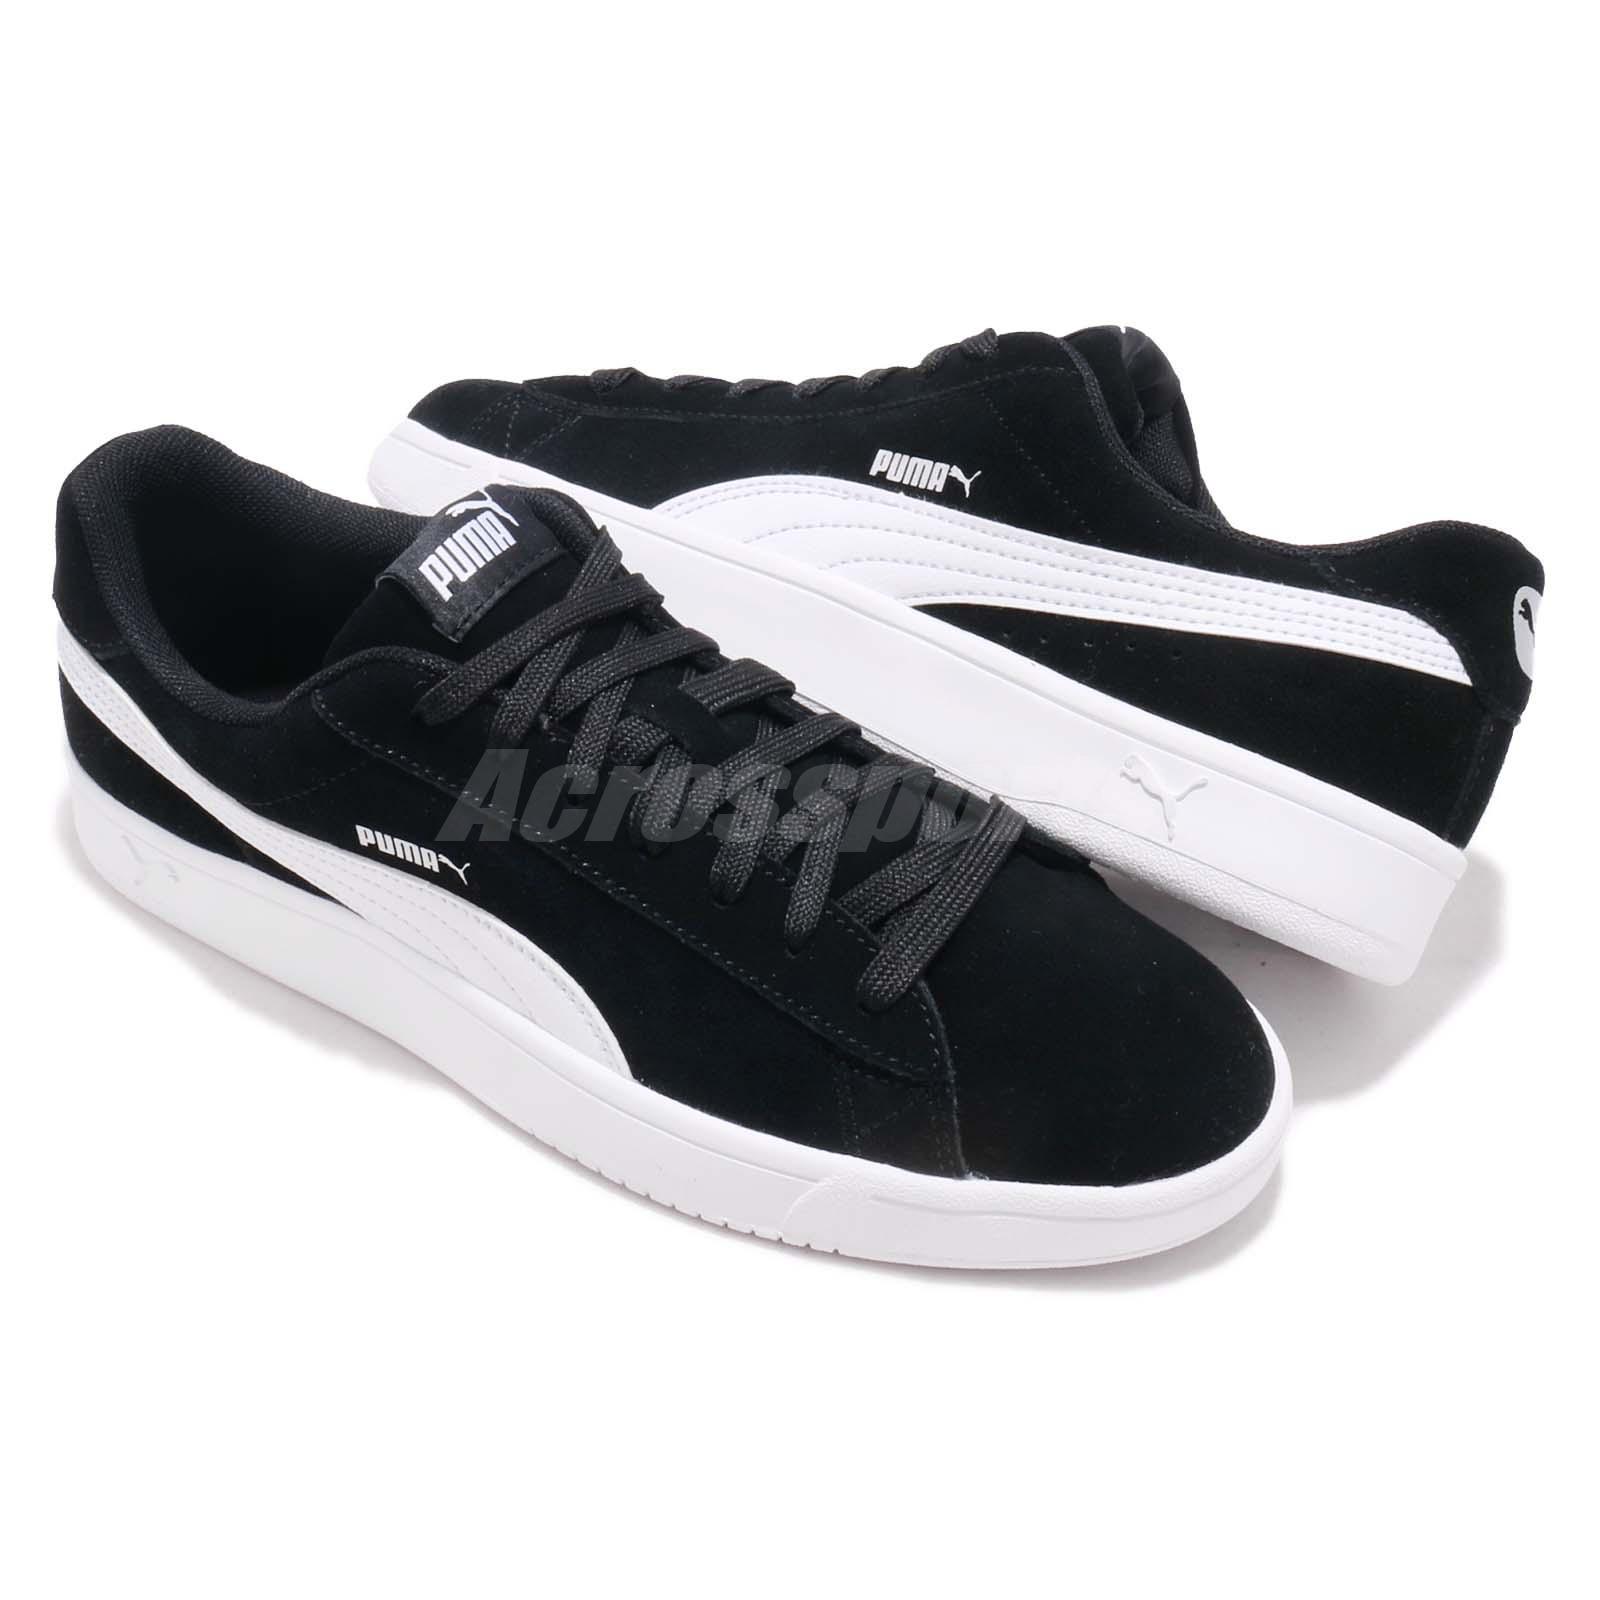 4c7b56718235 Puma Court Breaker Derby Black White Men Casual Shoes Sneakers ...